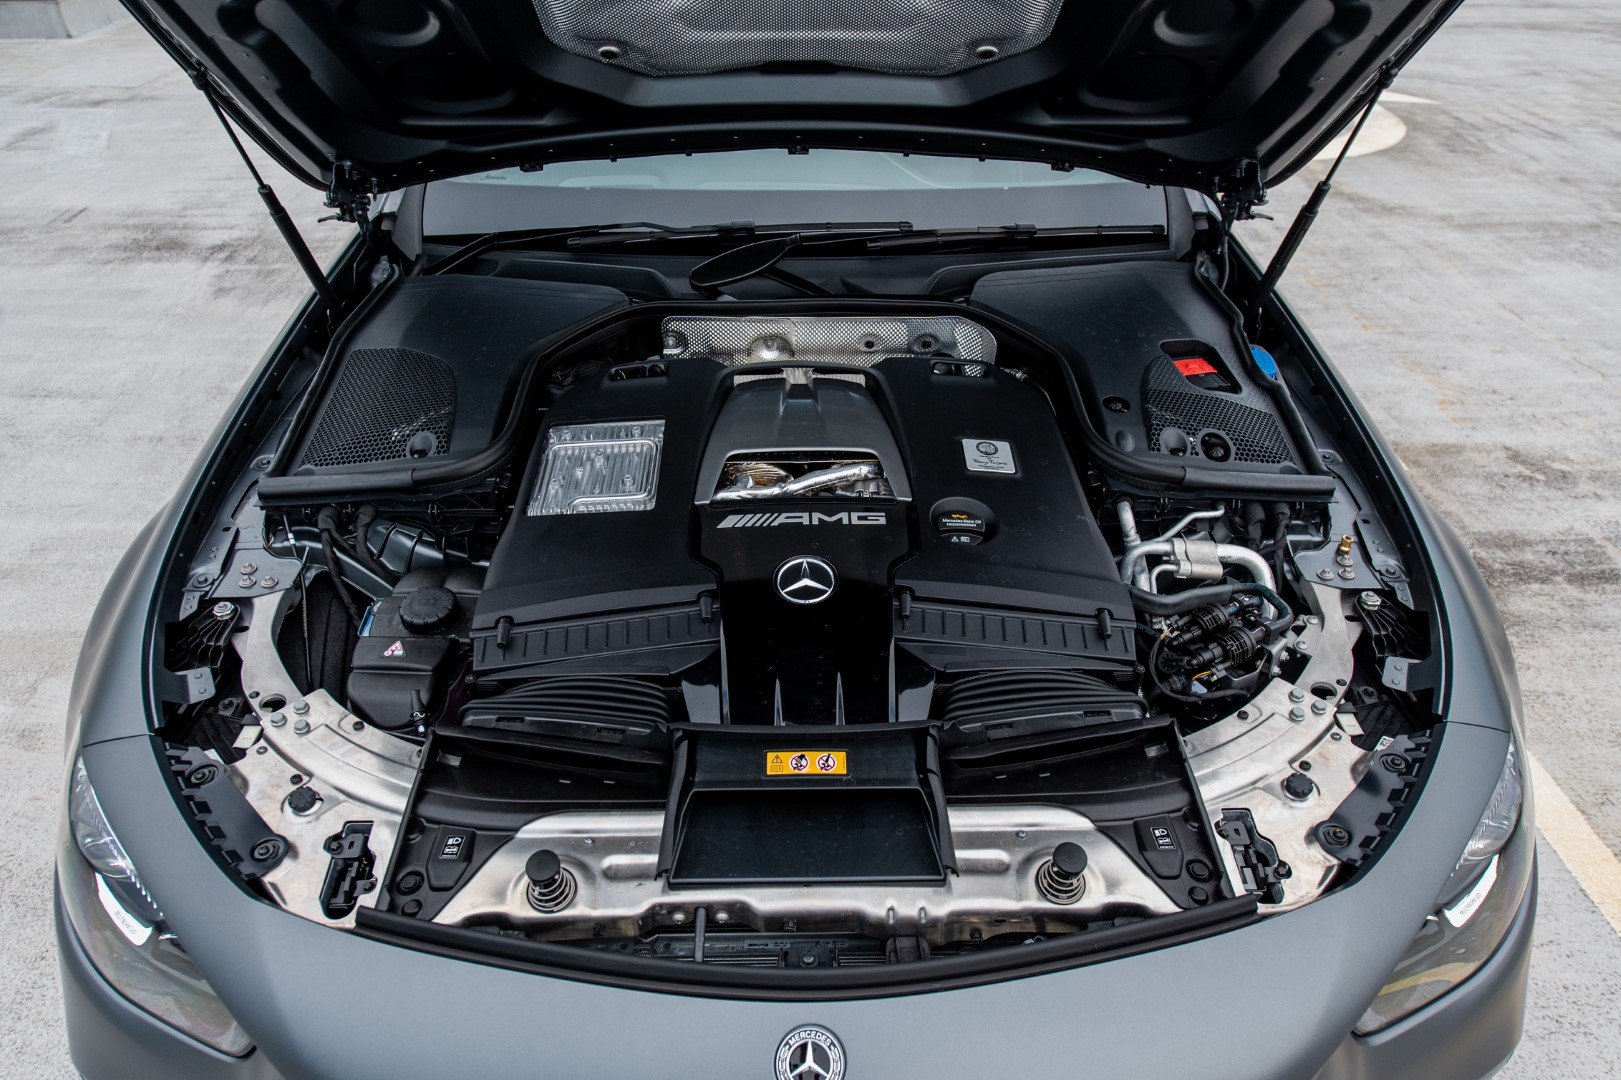 Mercedes-AMG E63 S engine